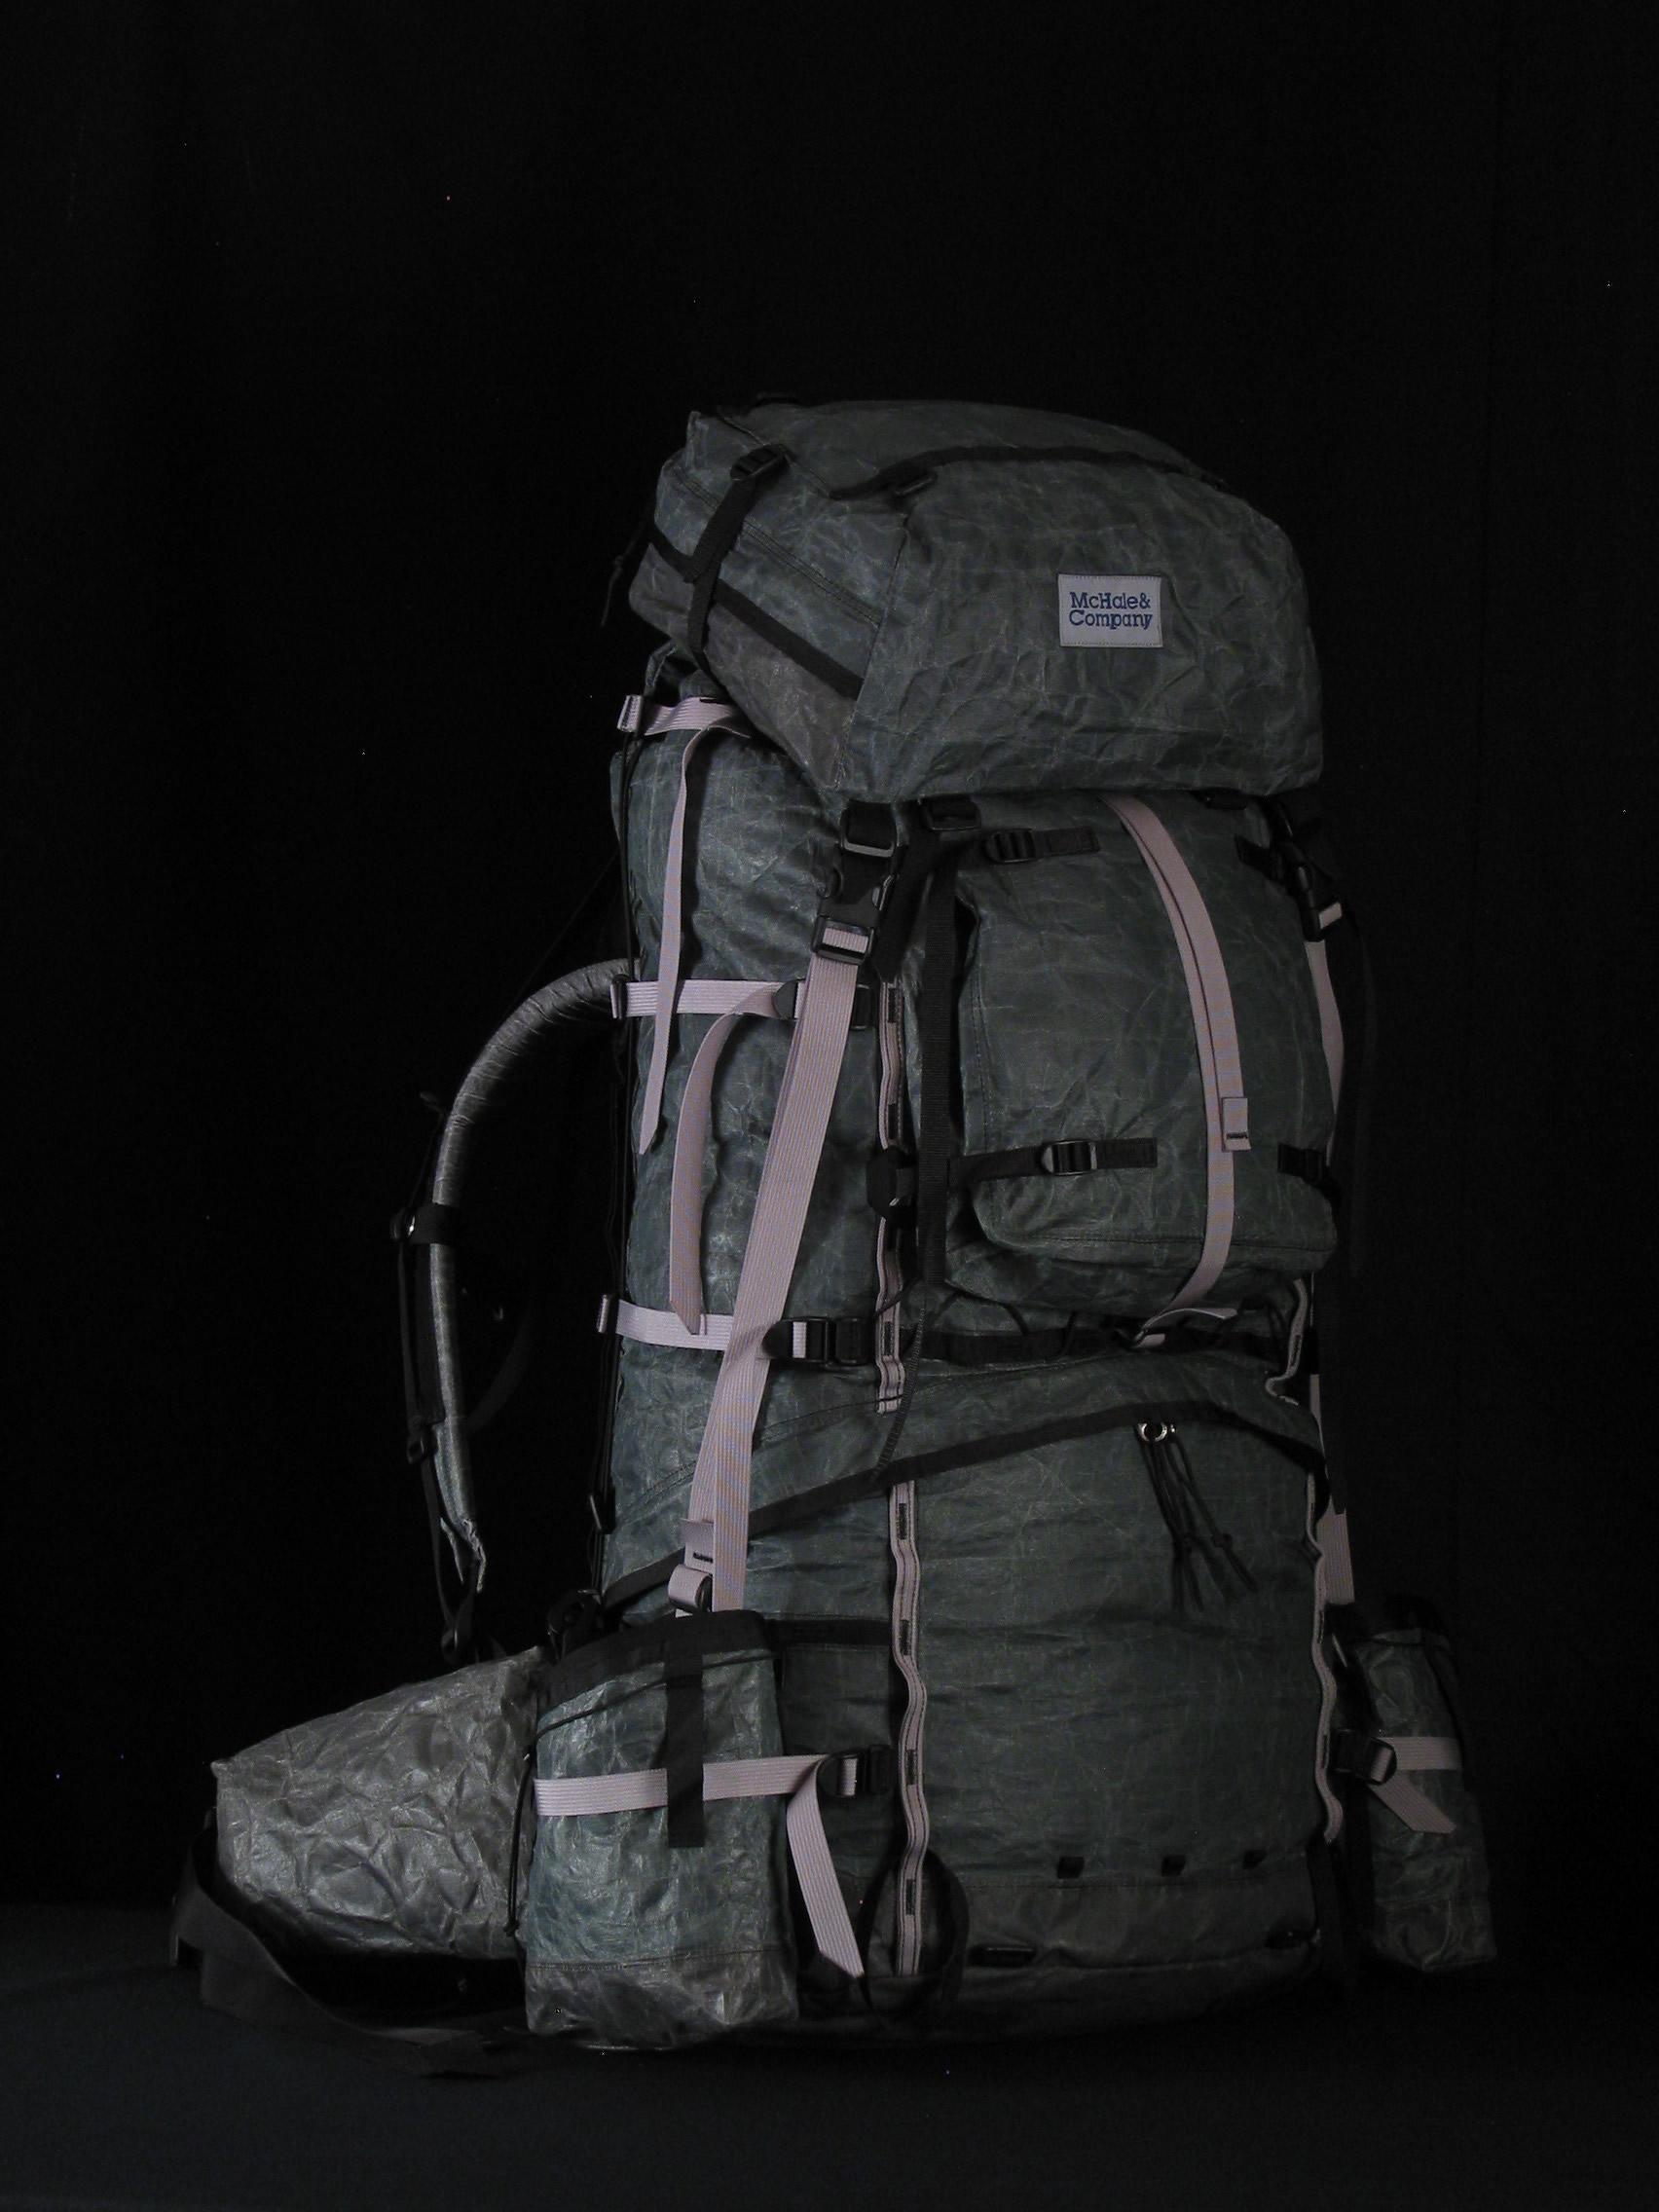 McHale Alpine Style Packs